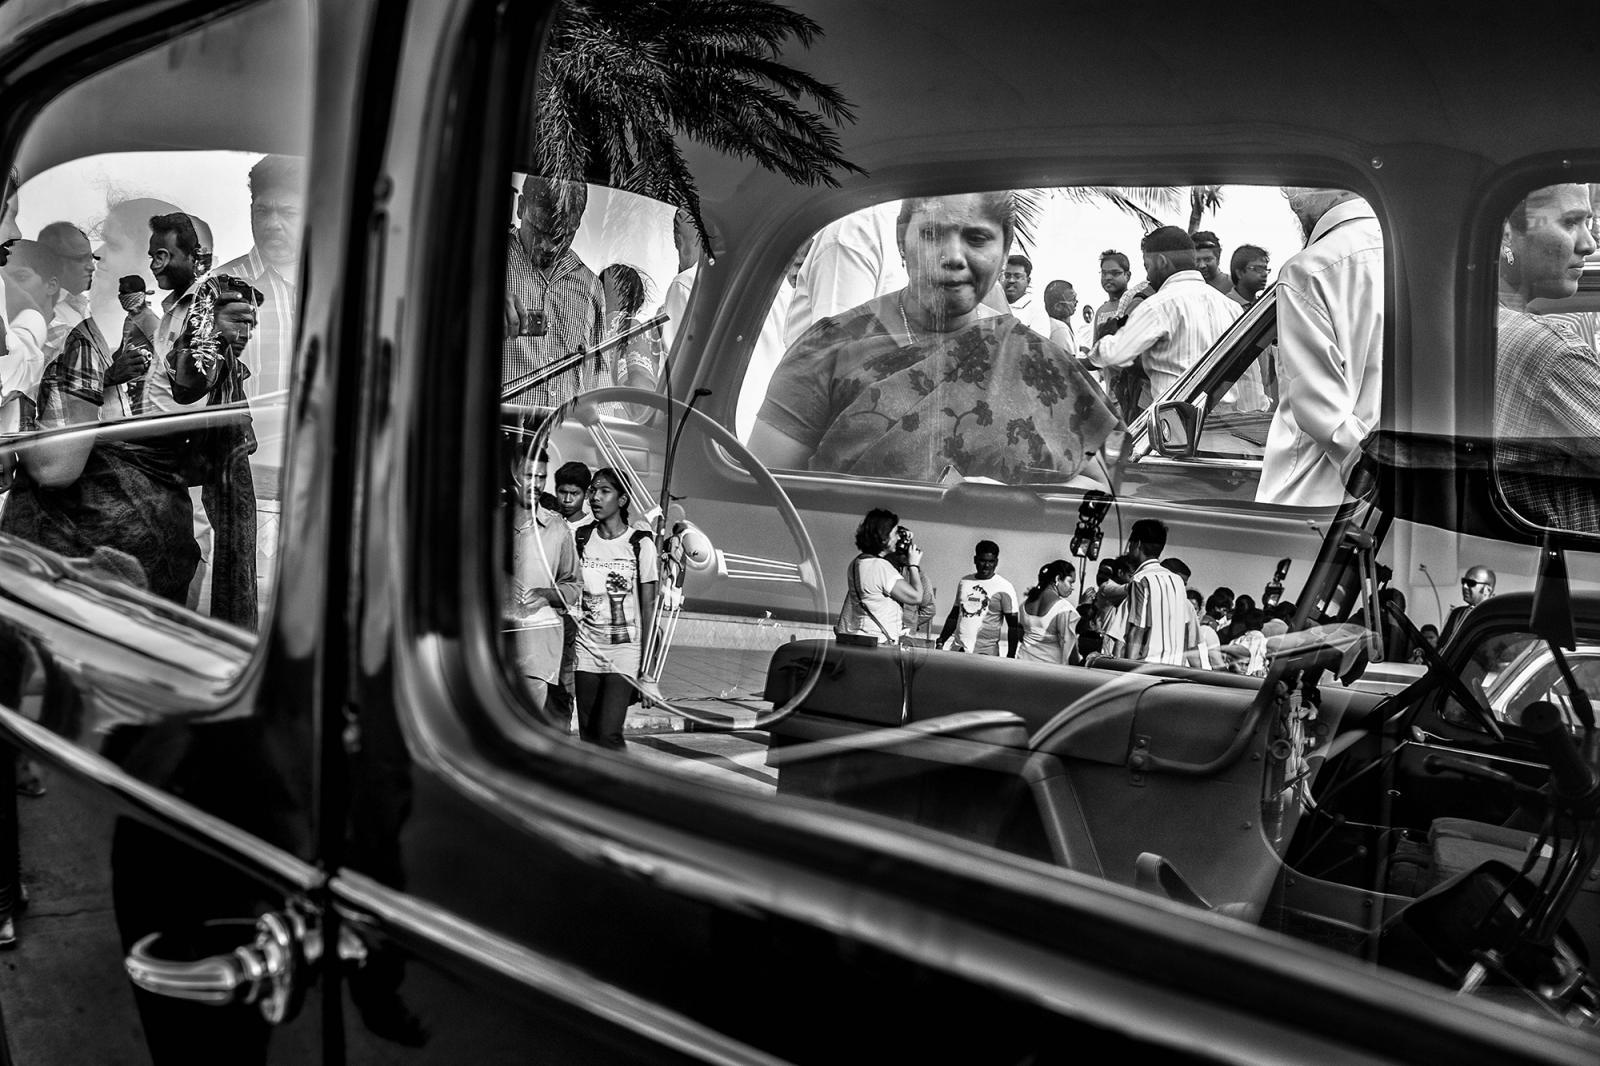 Photography image - Loading Car_Reflections___mouhamed_moustapha___photographer_pondicherry__mousty_photos__daily_life_pondicherry.jpg